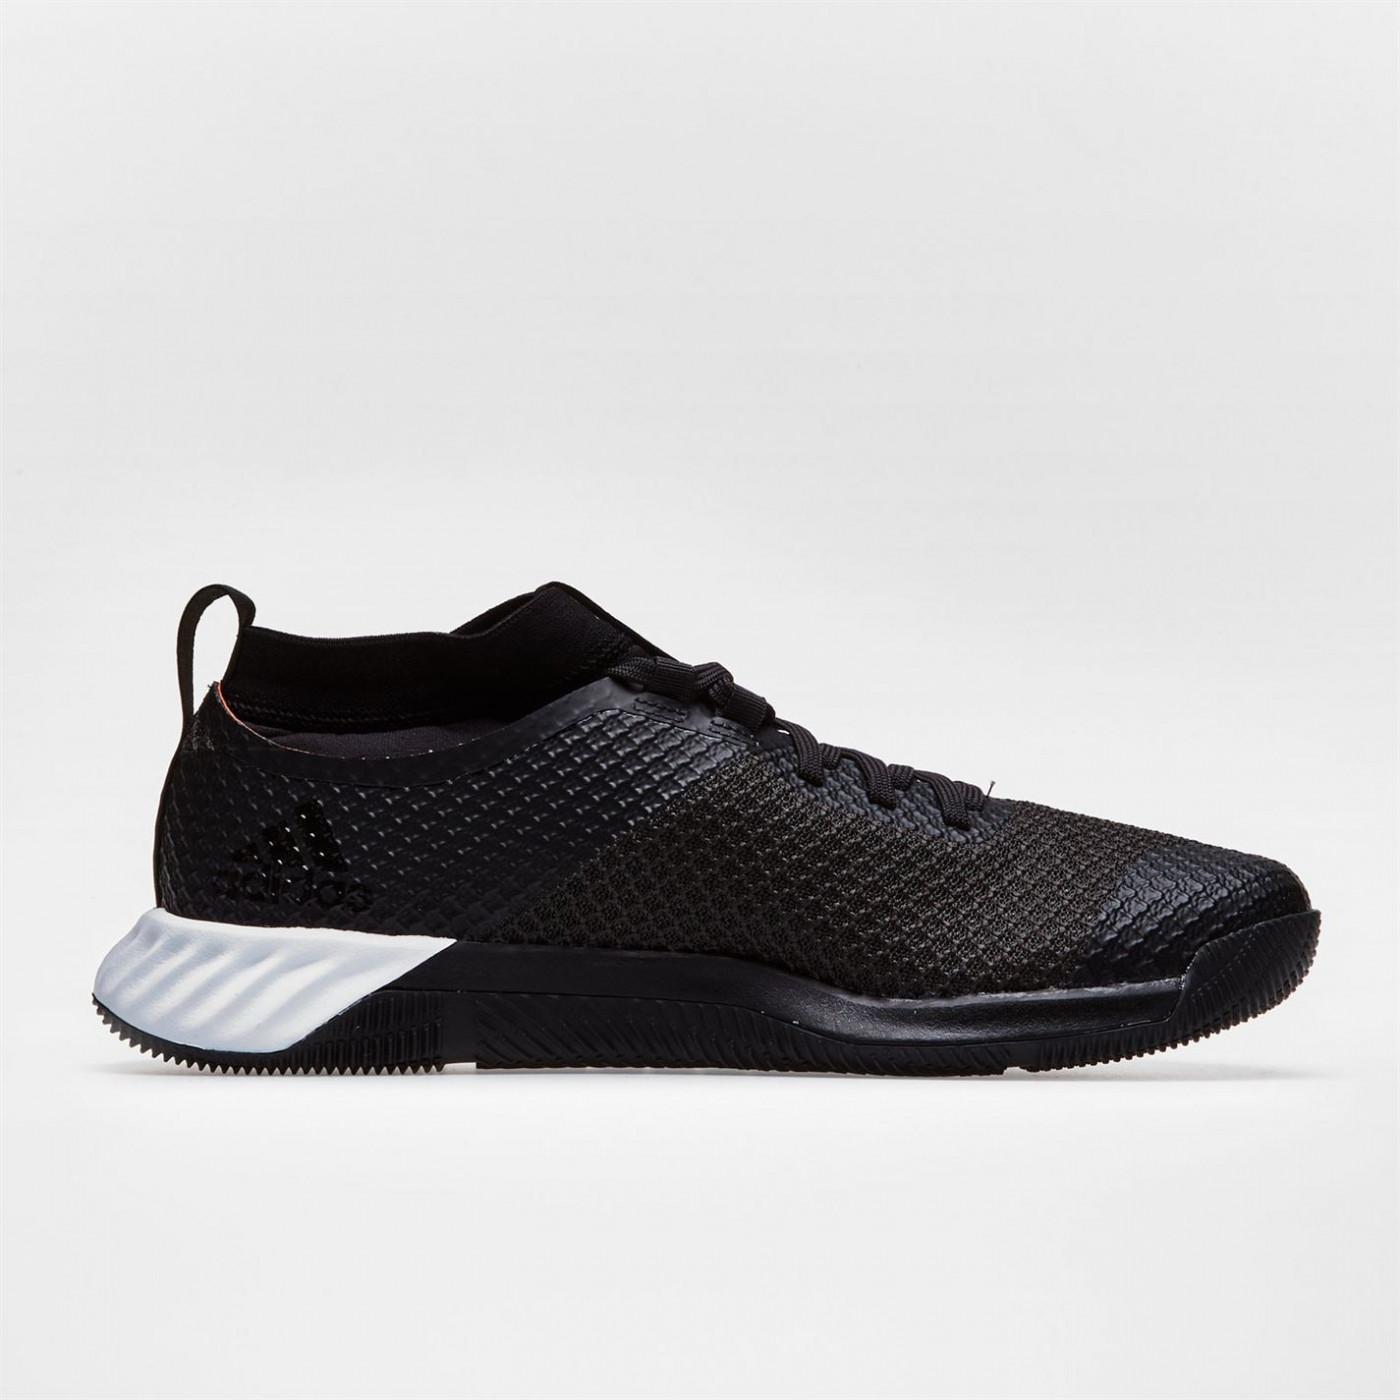 Adidas Crazytraitr Shoe